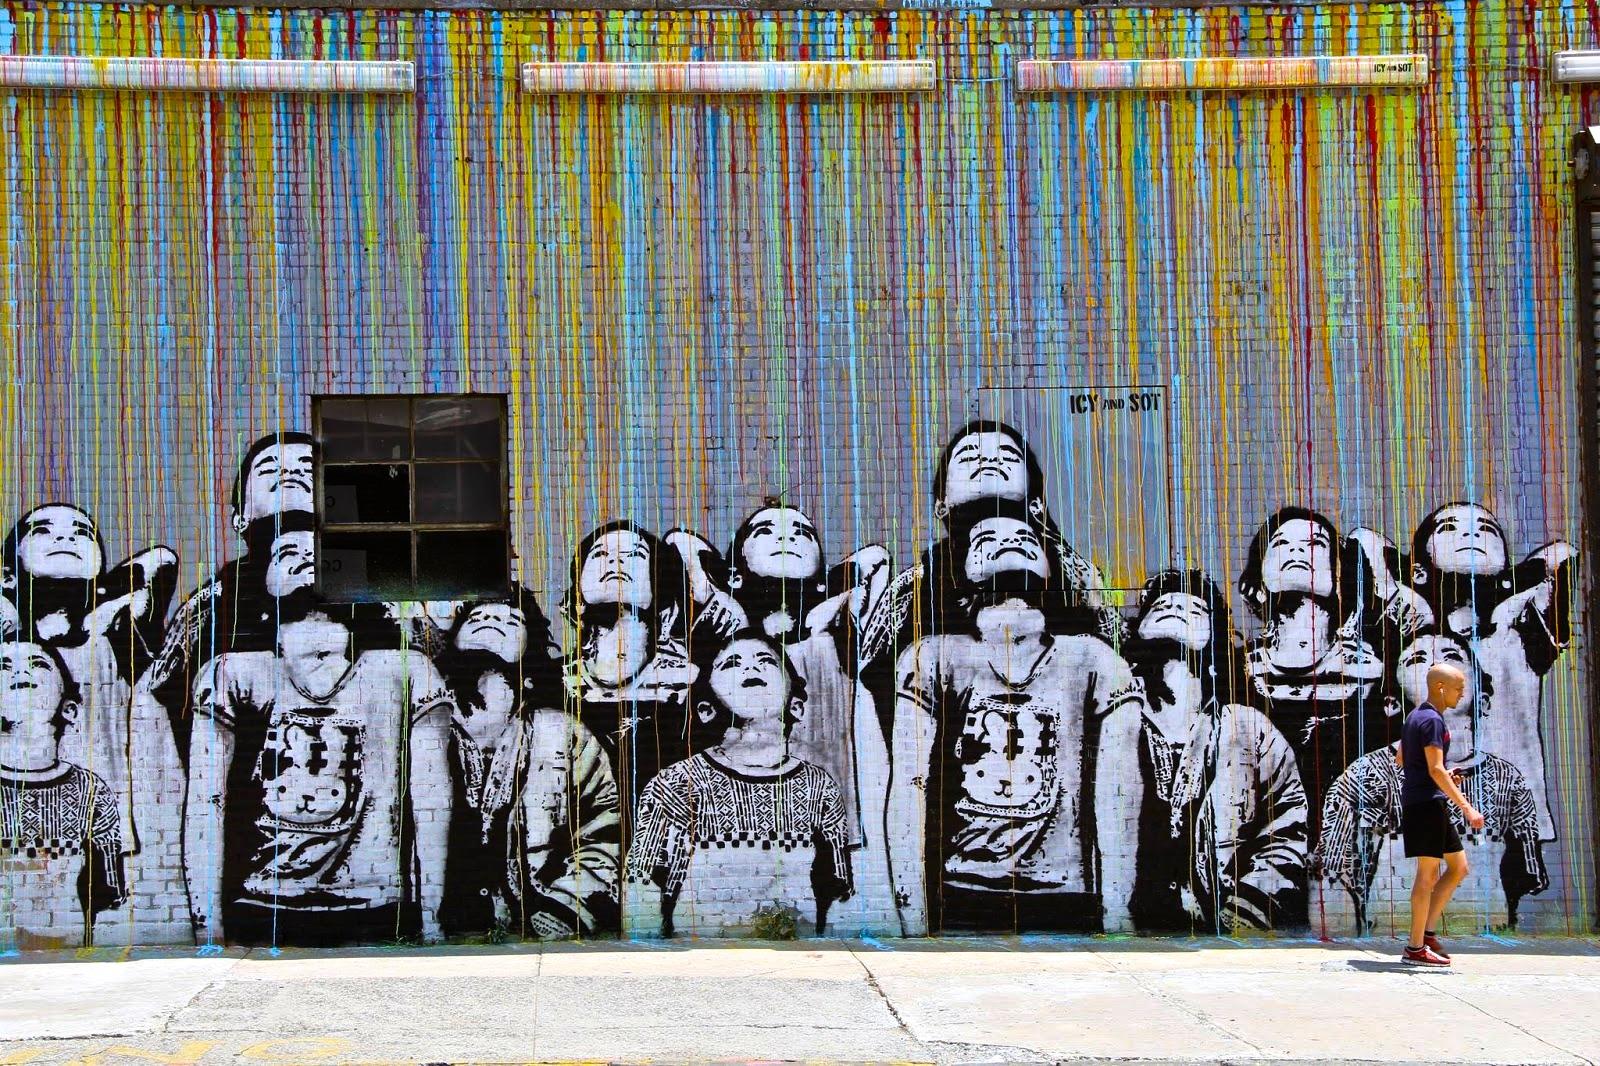 Icy & Sot street art